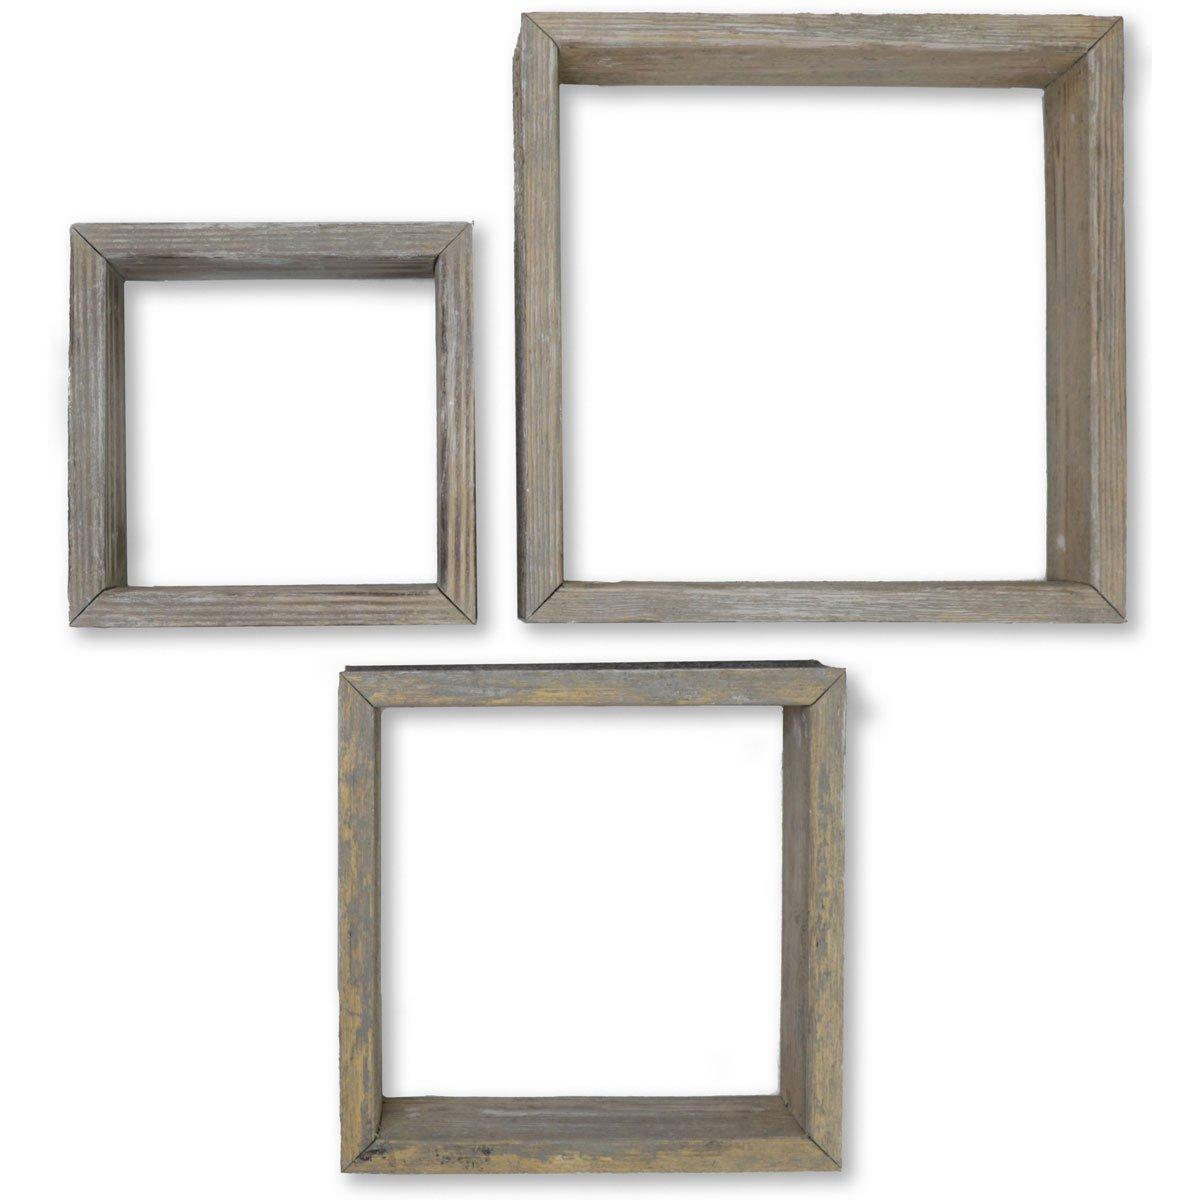 Ekena Millwork DECR15SBSQOBGY Shadow Box Shelves, Reclaimed Grey